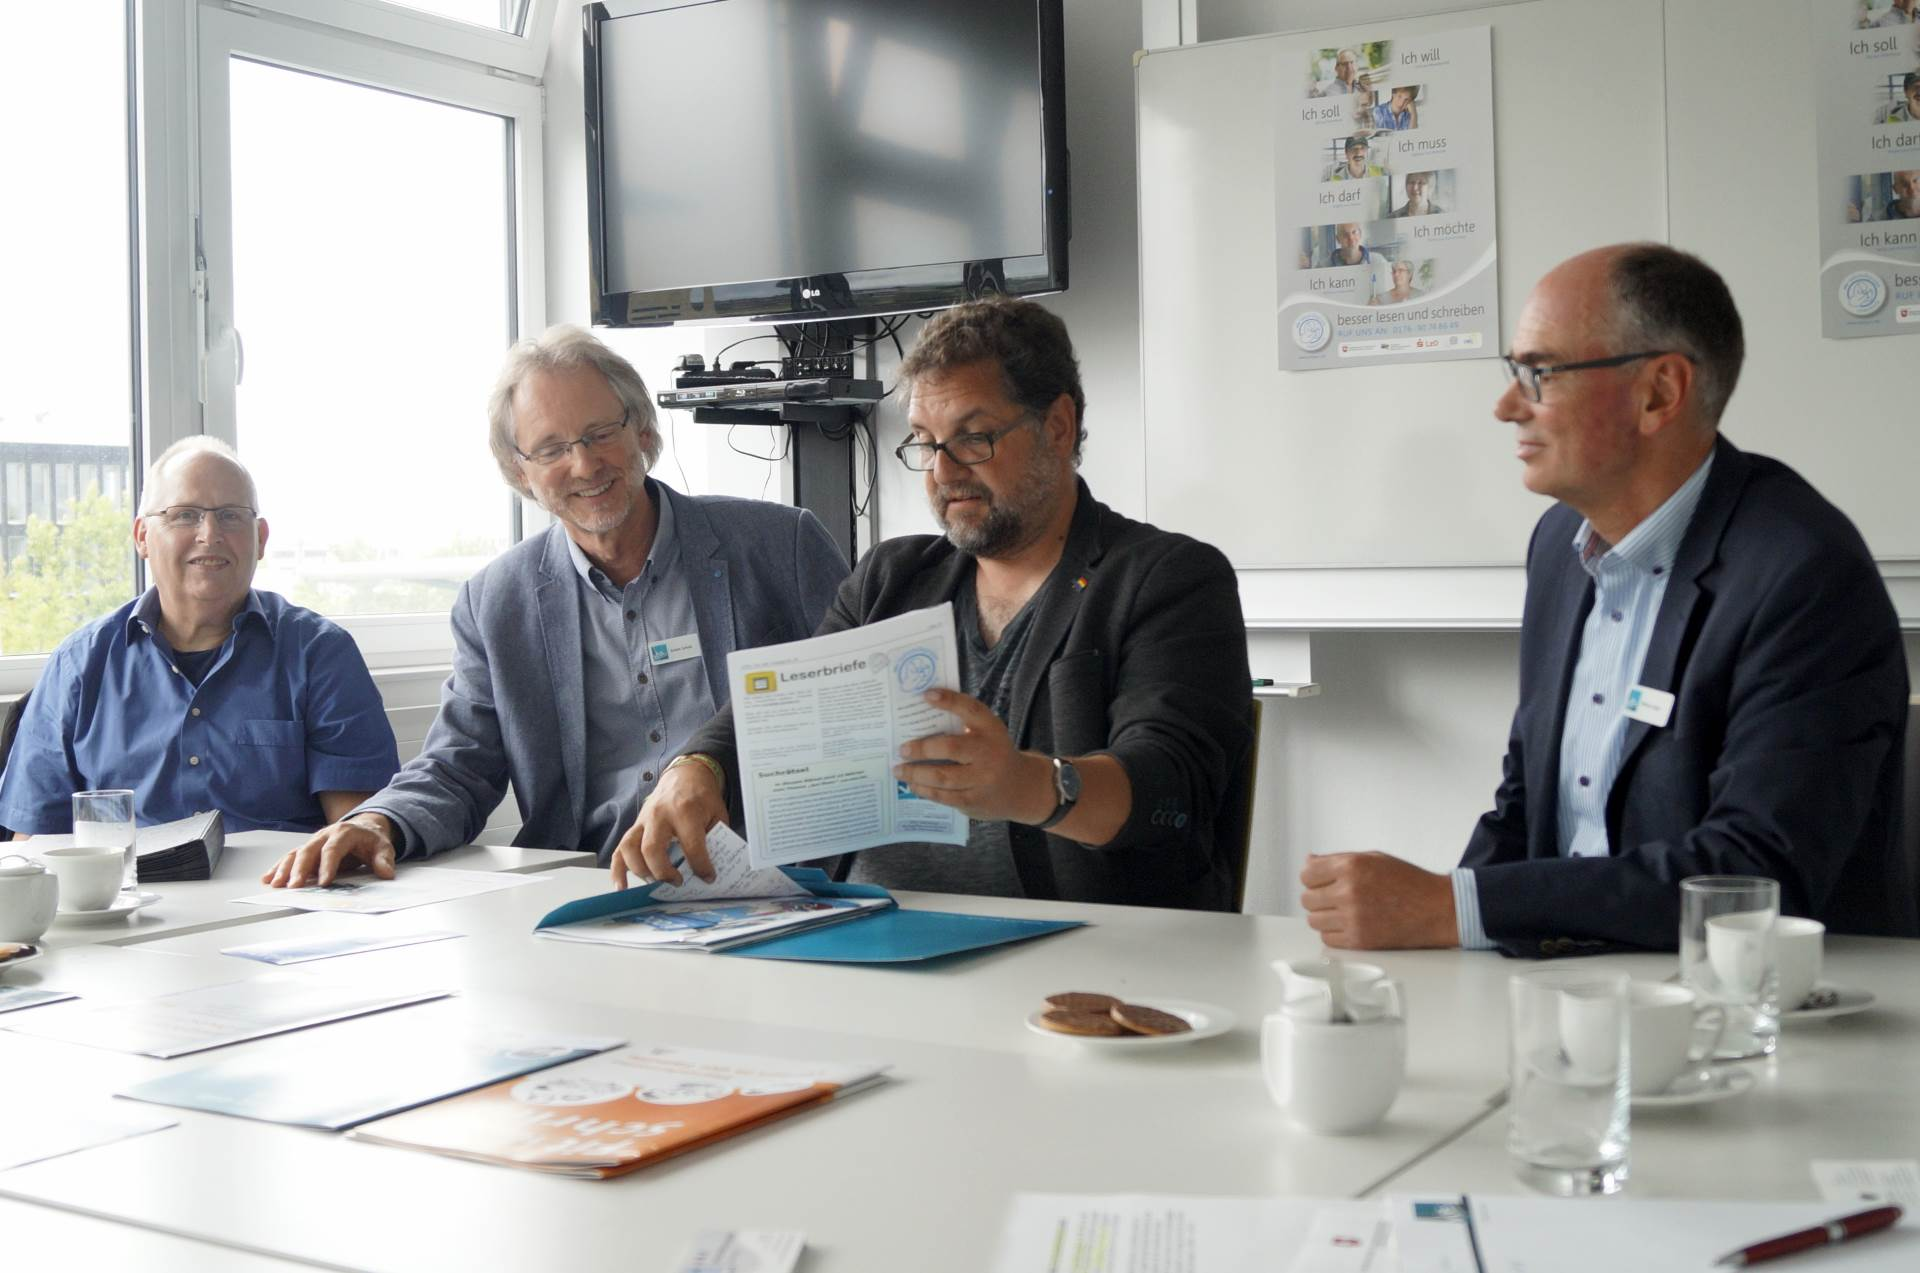 von li.: Ernst Lorenzen, Achim Scholz, Peter Meiwald, Andreas Gögel  / Foto: Lea Feline Müller